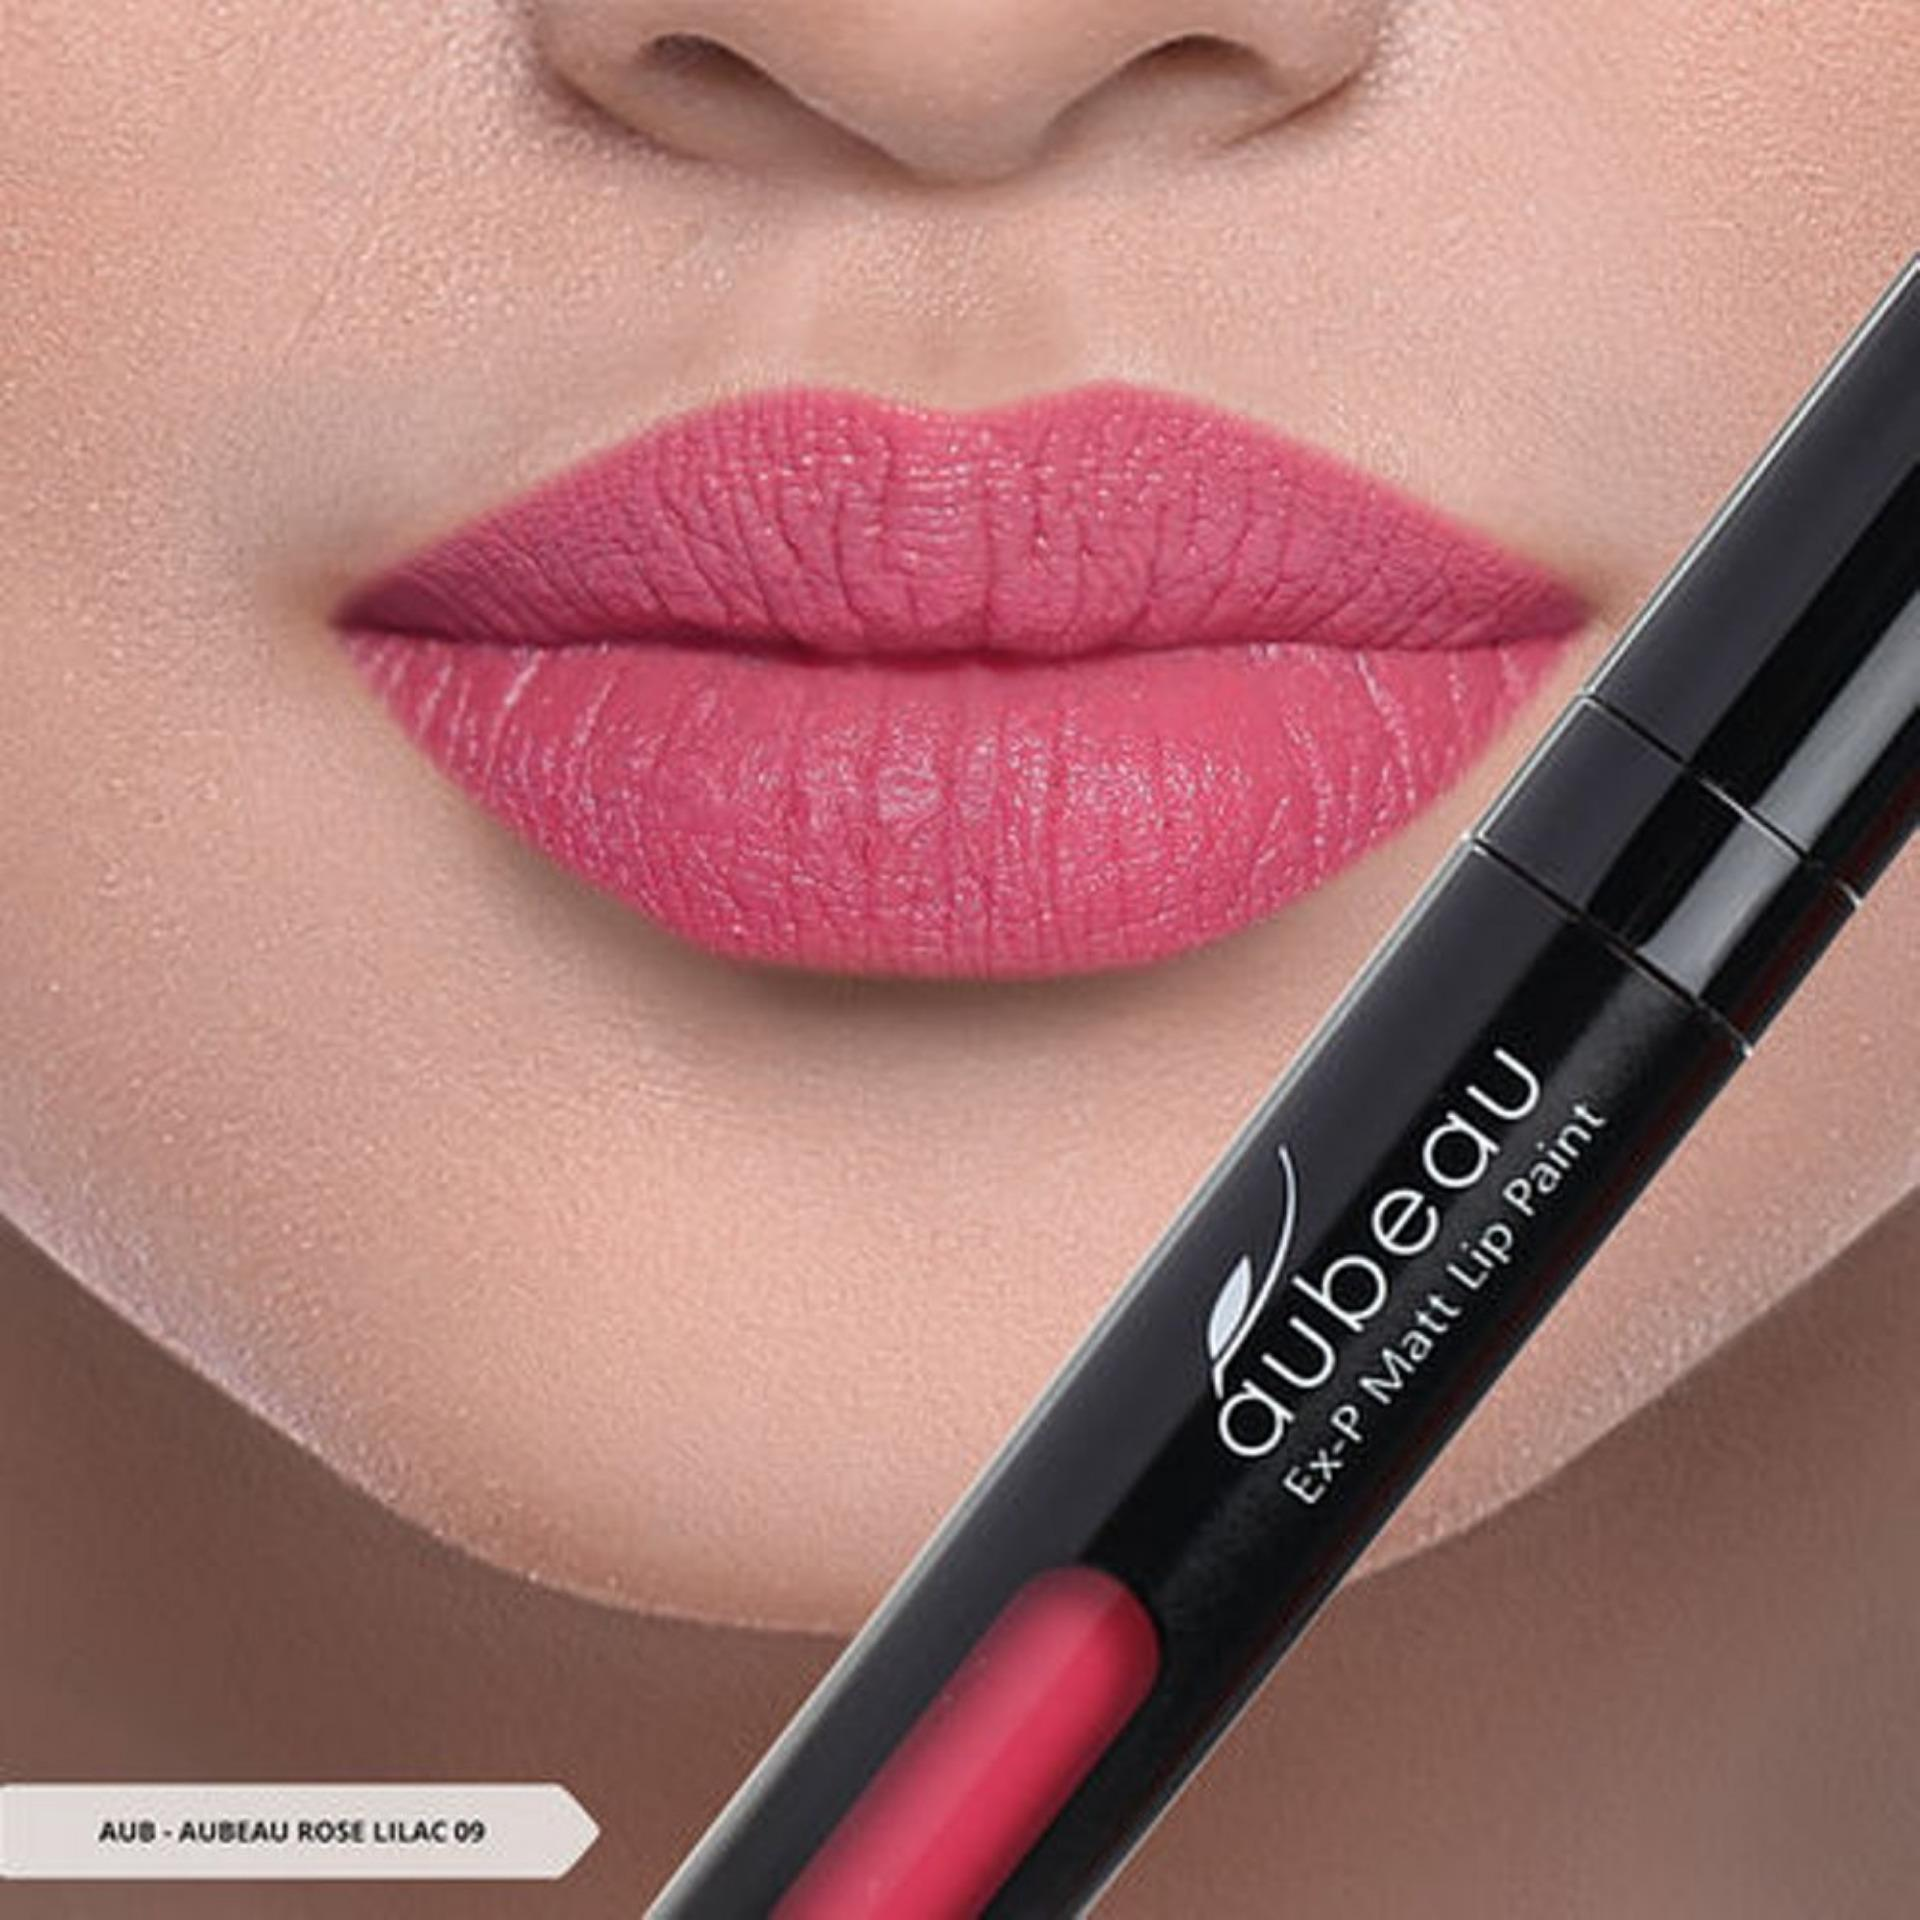 Aubeau Ex-P Matt Lip Paint (09 Rose Lilac) - Warna Pigmented Lipstick Matte